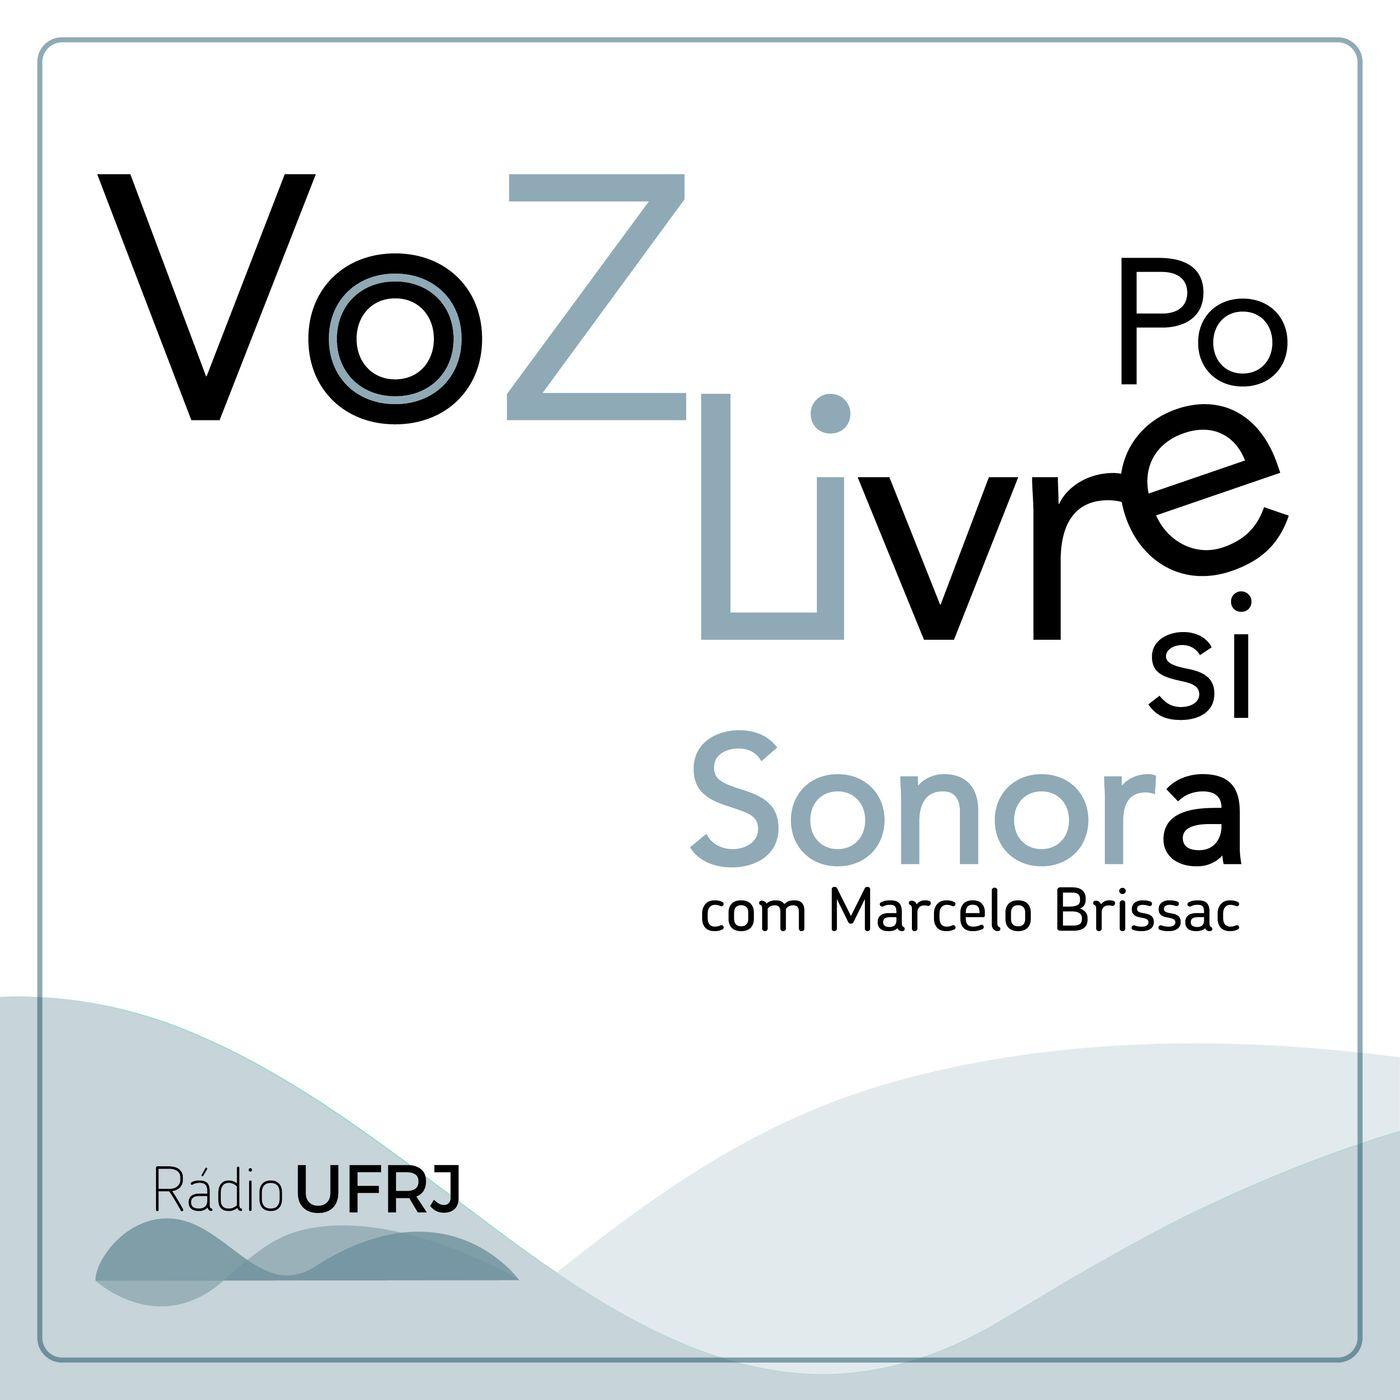 A Voz Livre (Poesia Sonora) - ep 53